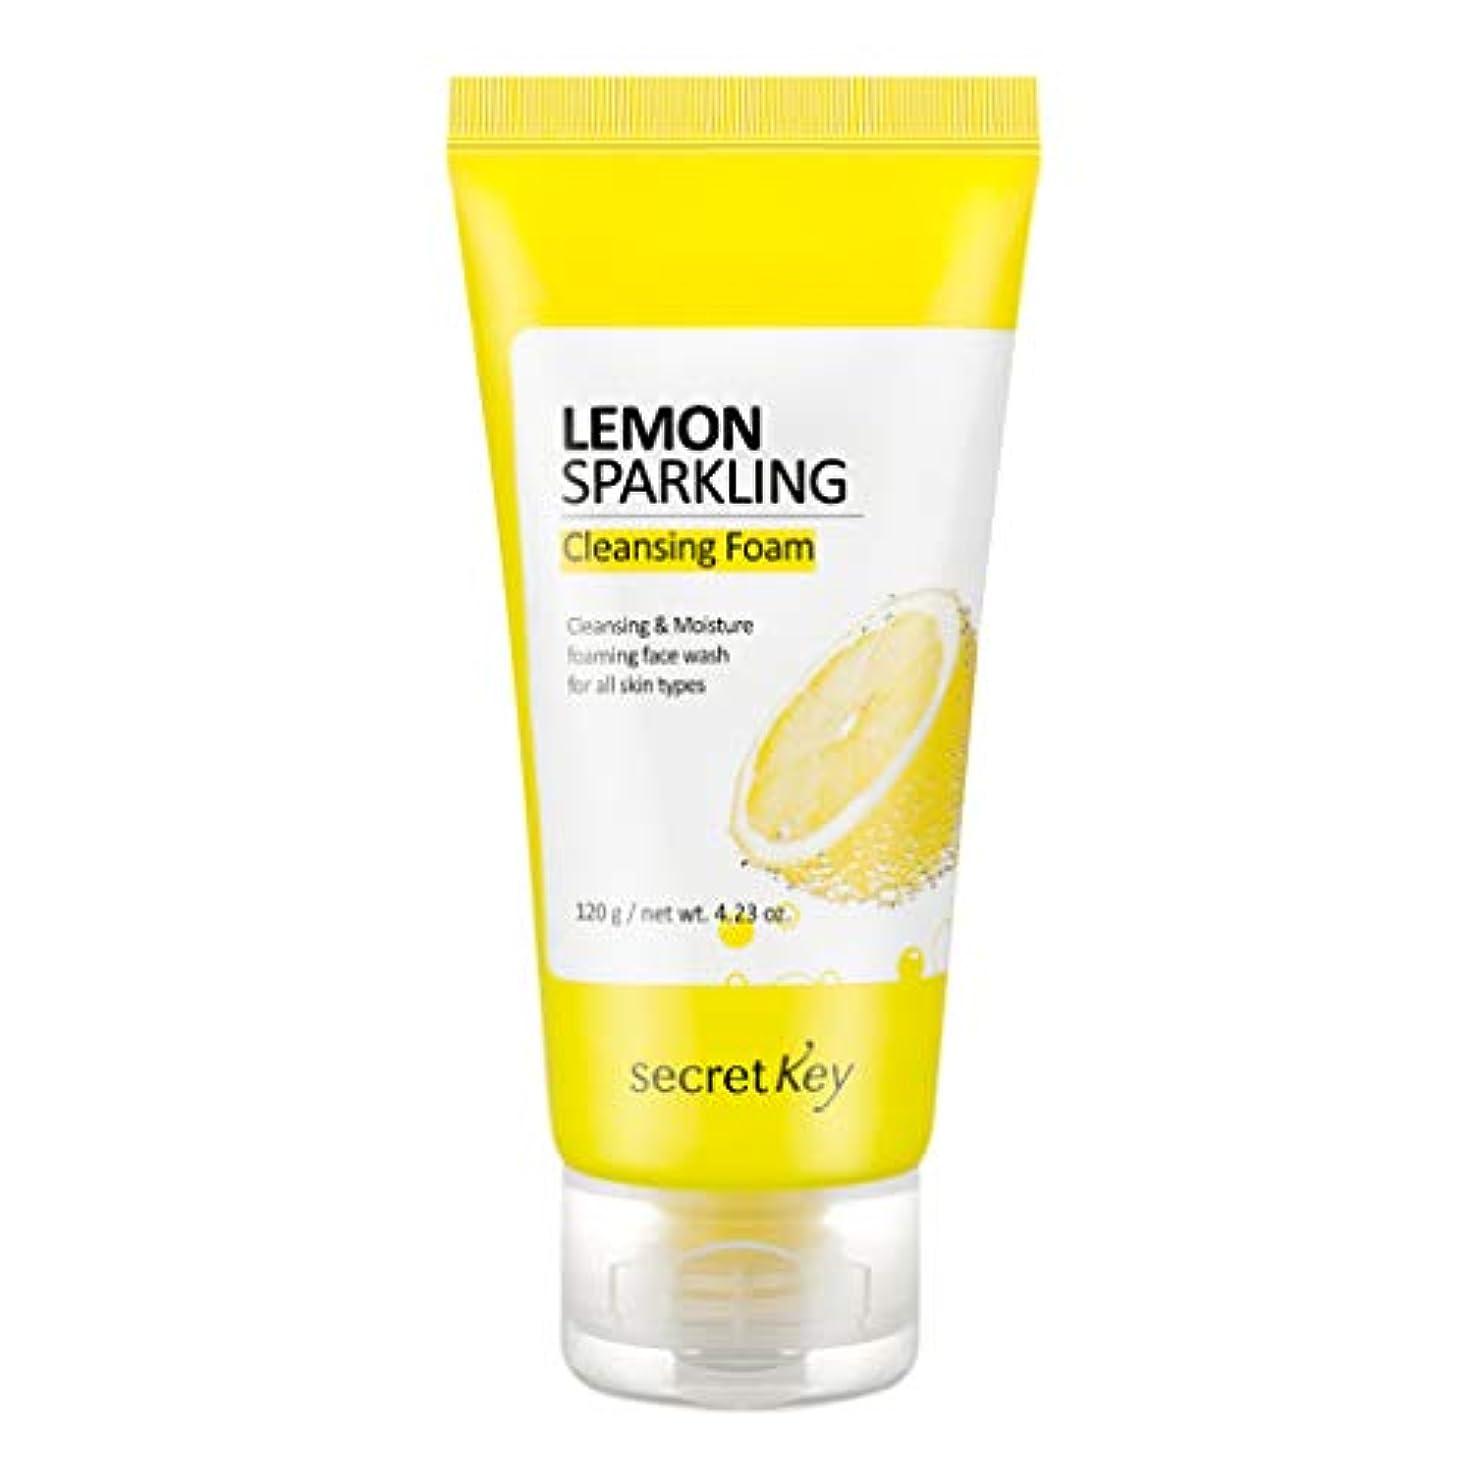 SECRET KEY Lemon Sparkling Cleansing Foam (並行輸入品)